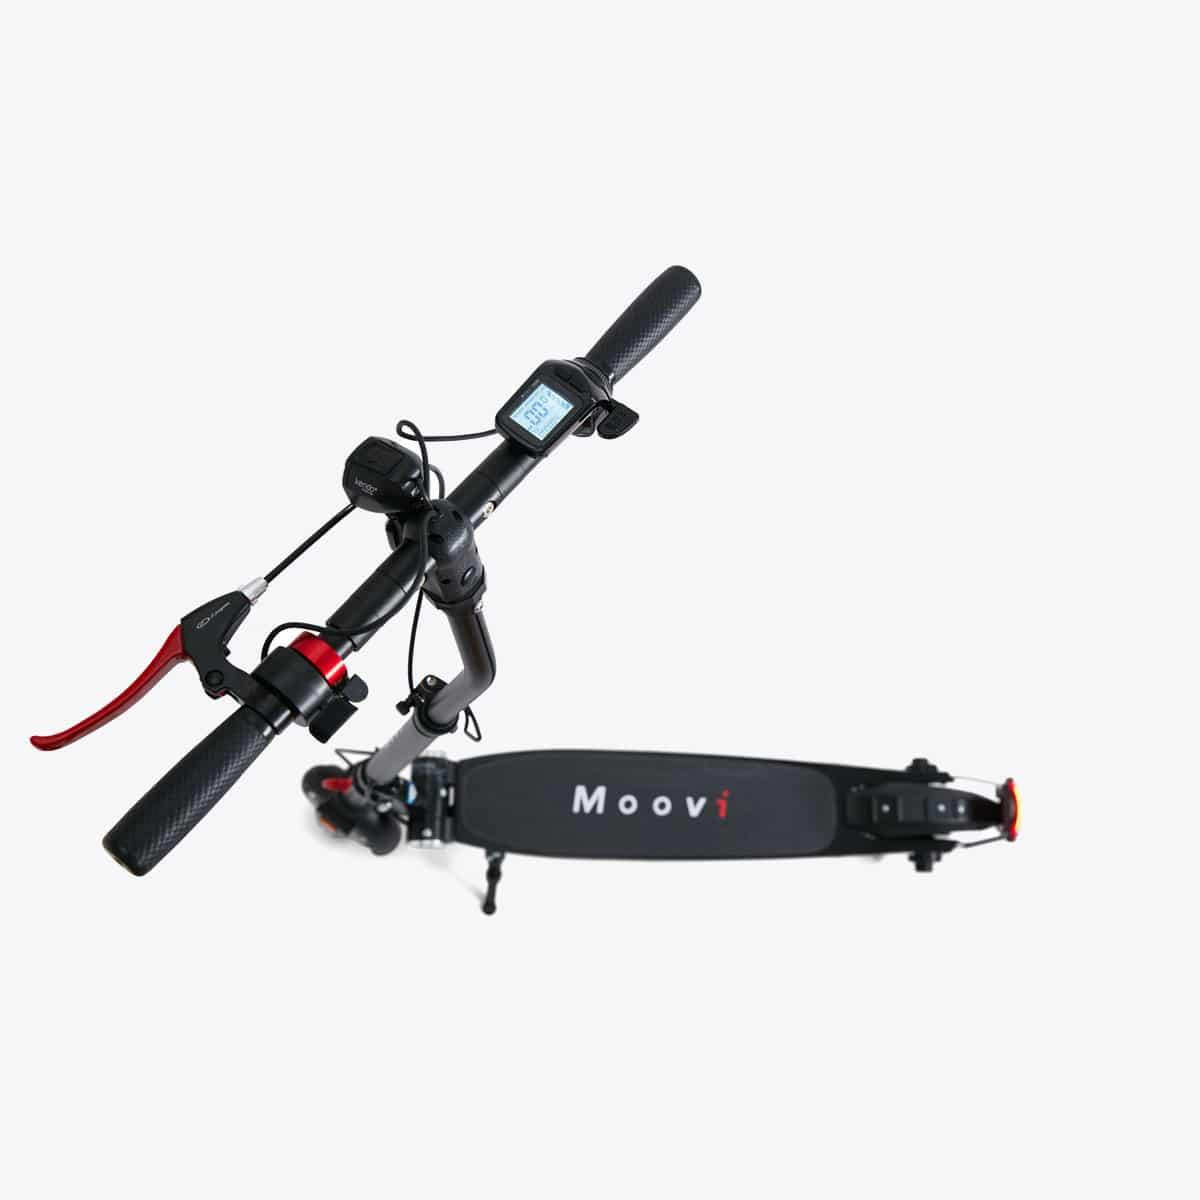 moovi-escooter-stvo-strassenzulassung-bremse-lenker-licht